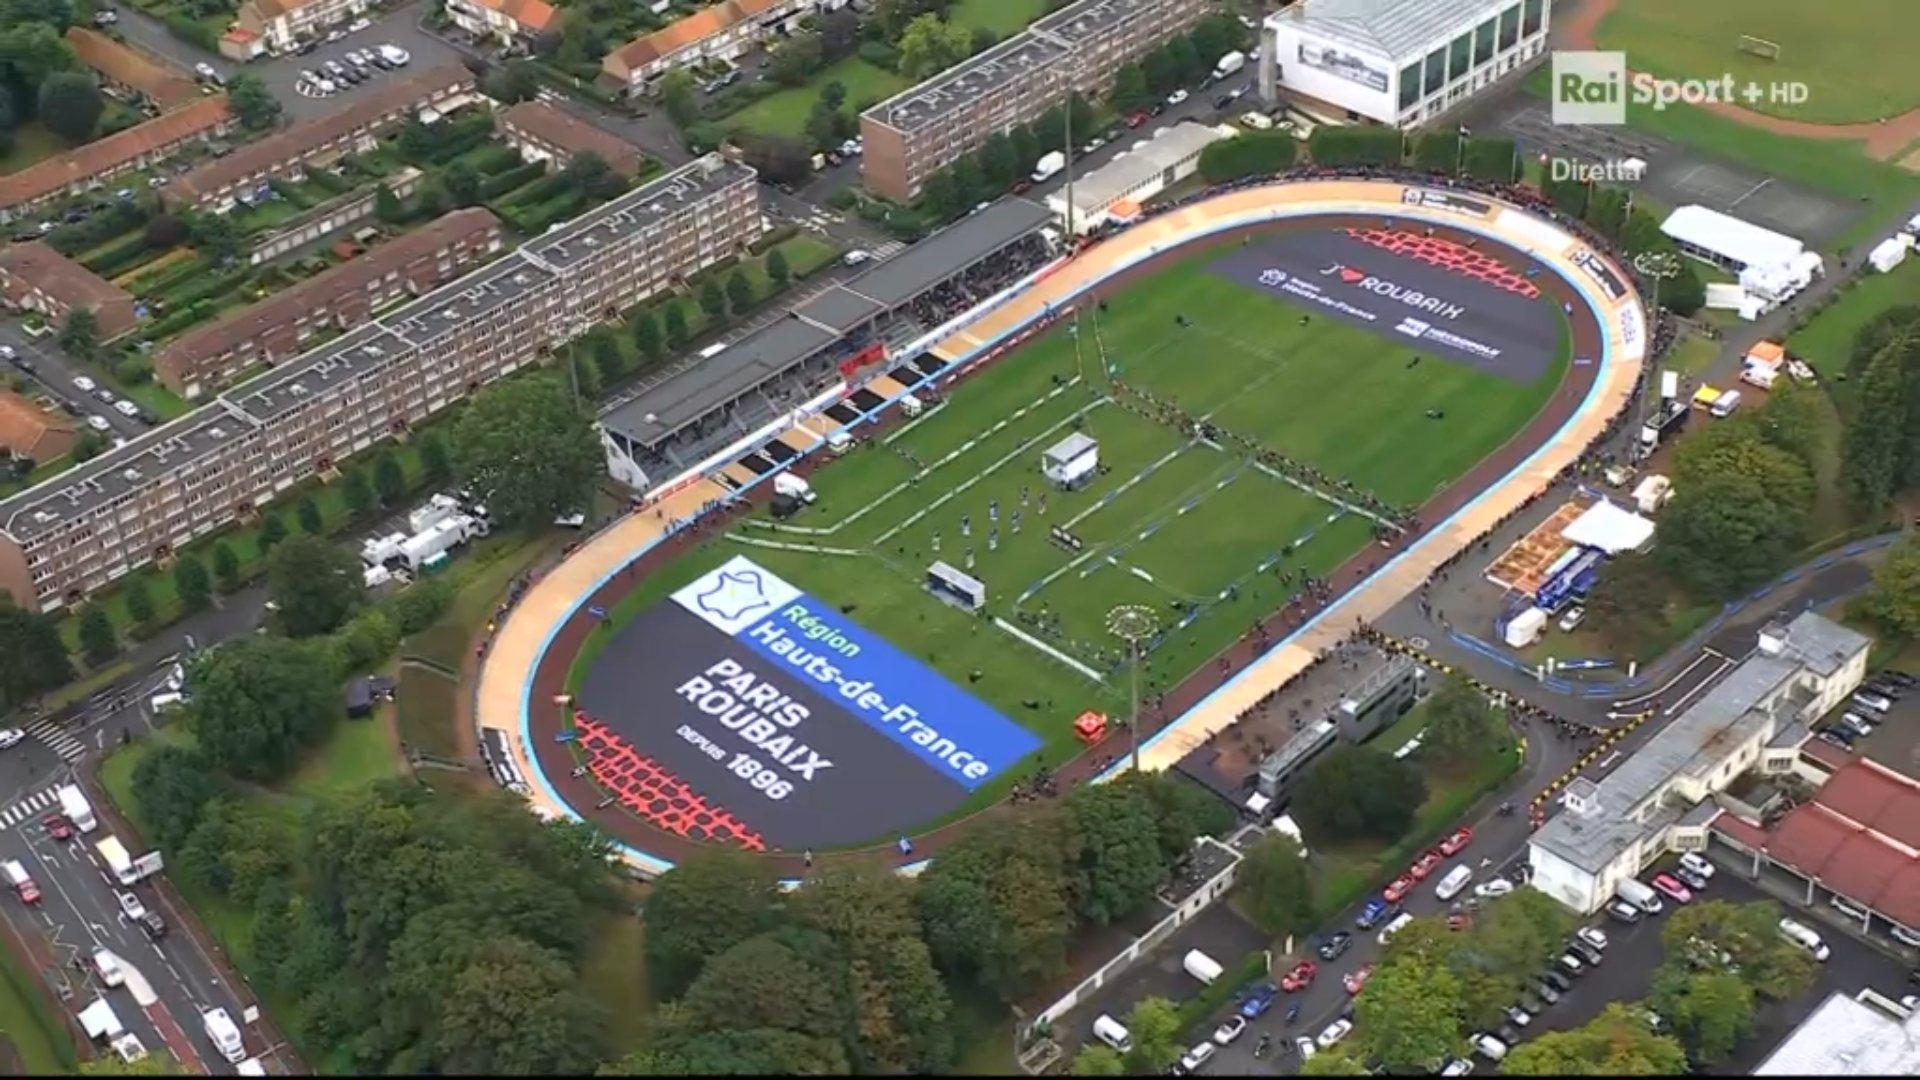 Domenica Rai Sport, 3 Ottobre 2021   diretta Ciclismo Parigi > Roubaix